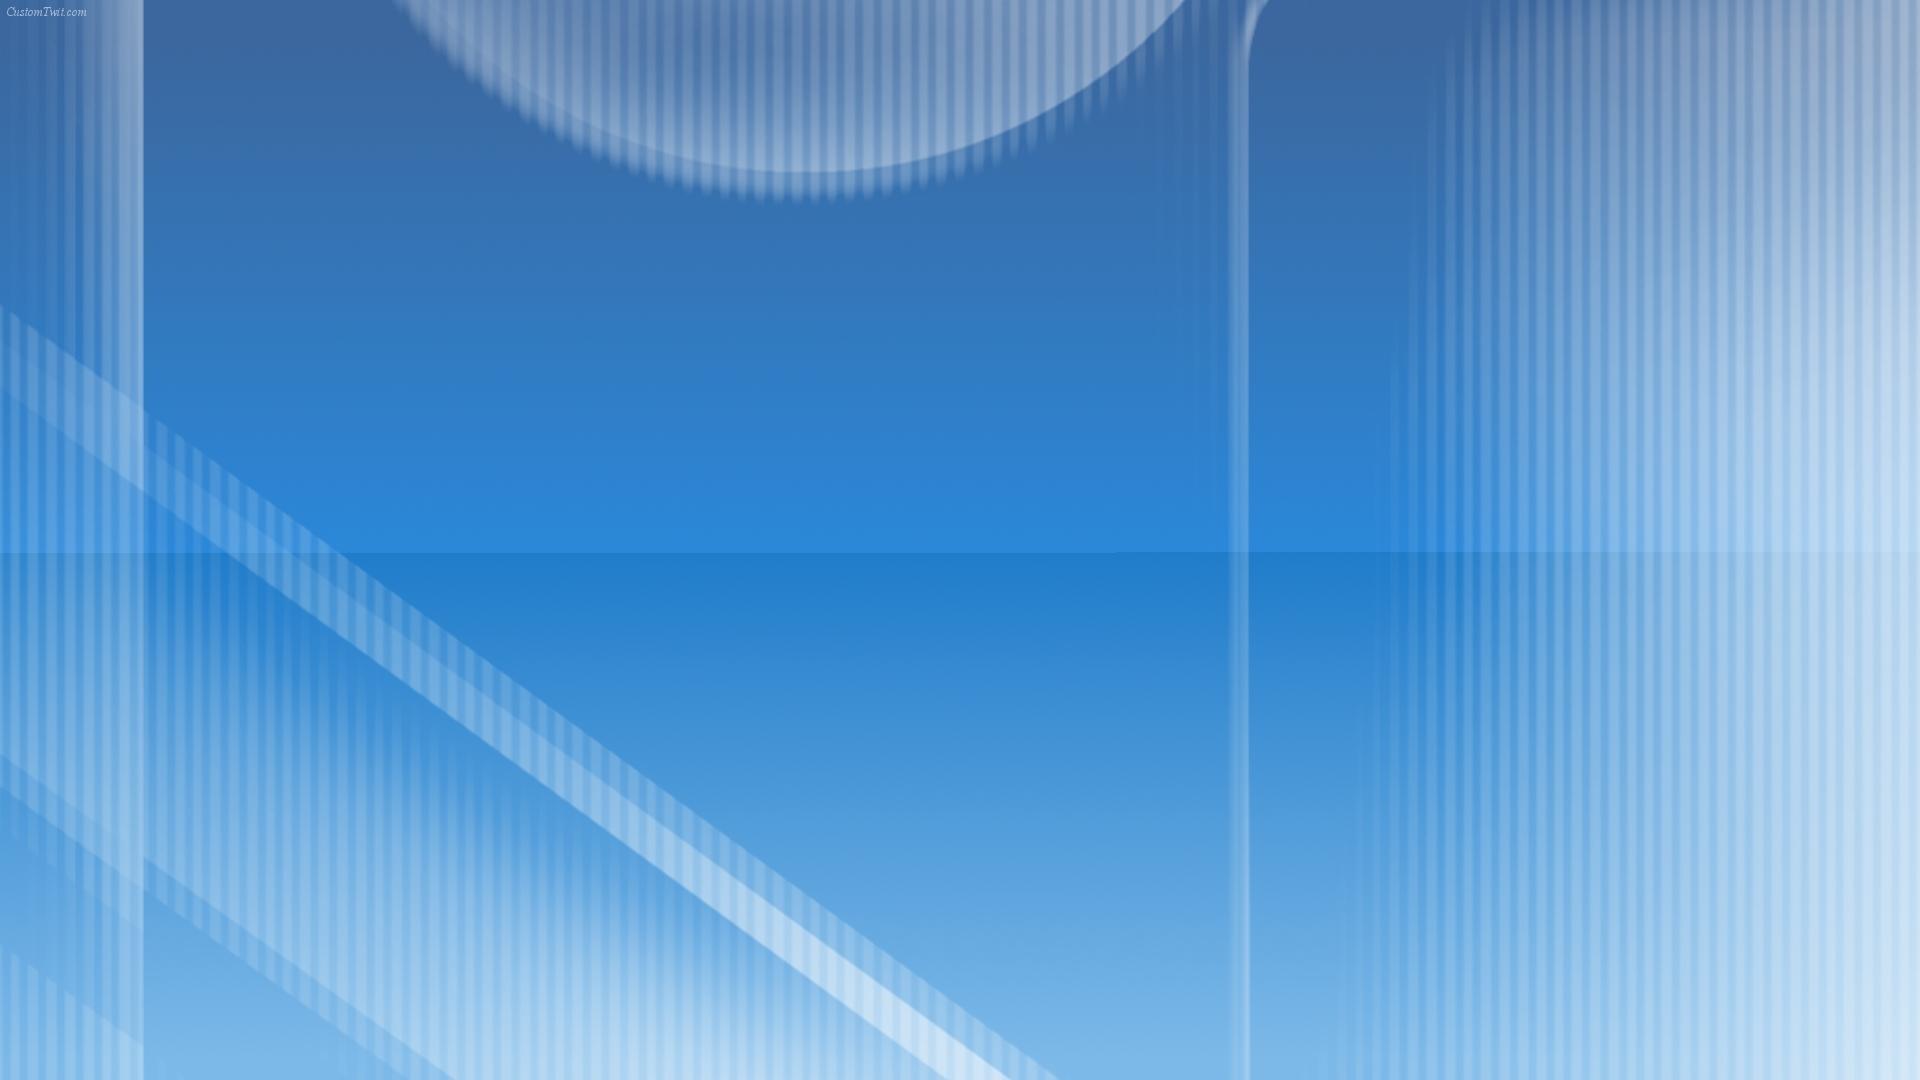 Background Images For Business Websites